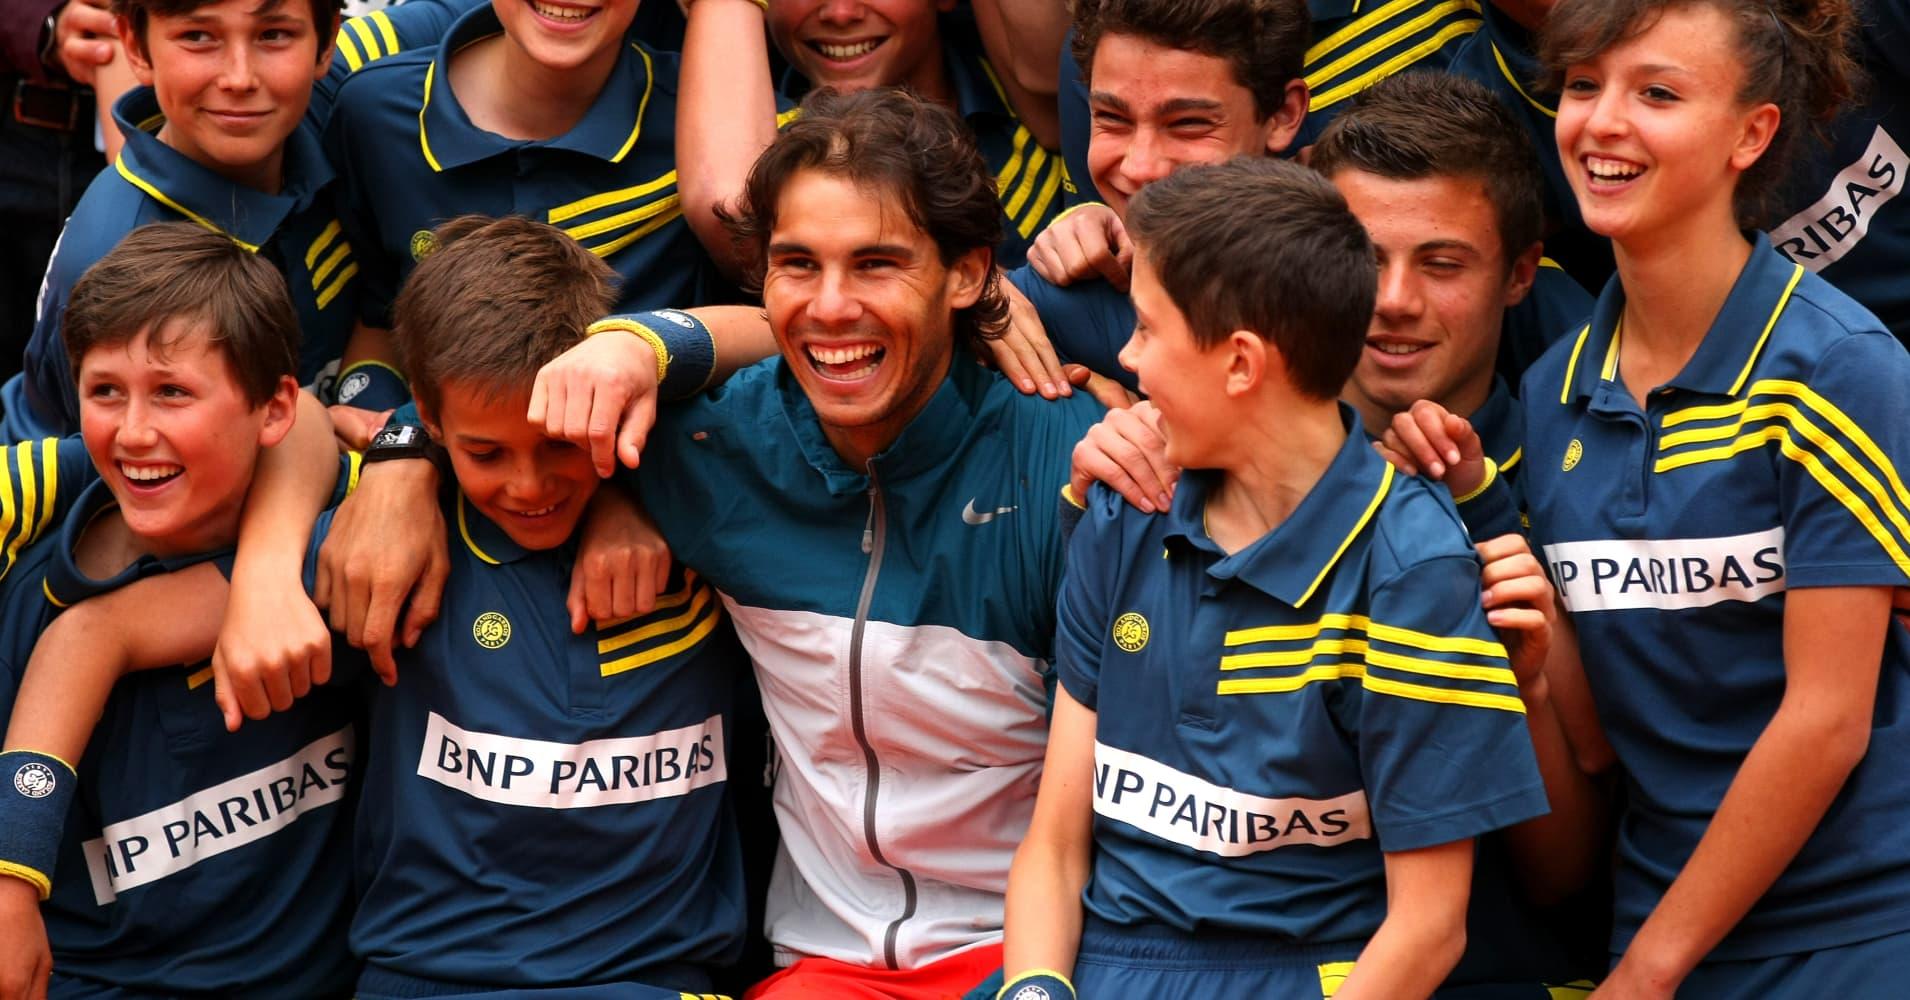 Tennis legend Rafael Nadal with the ballkids at Roland Garros in 2013